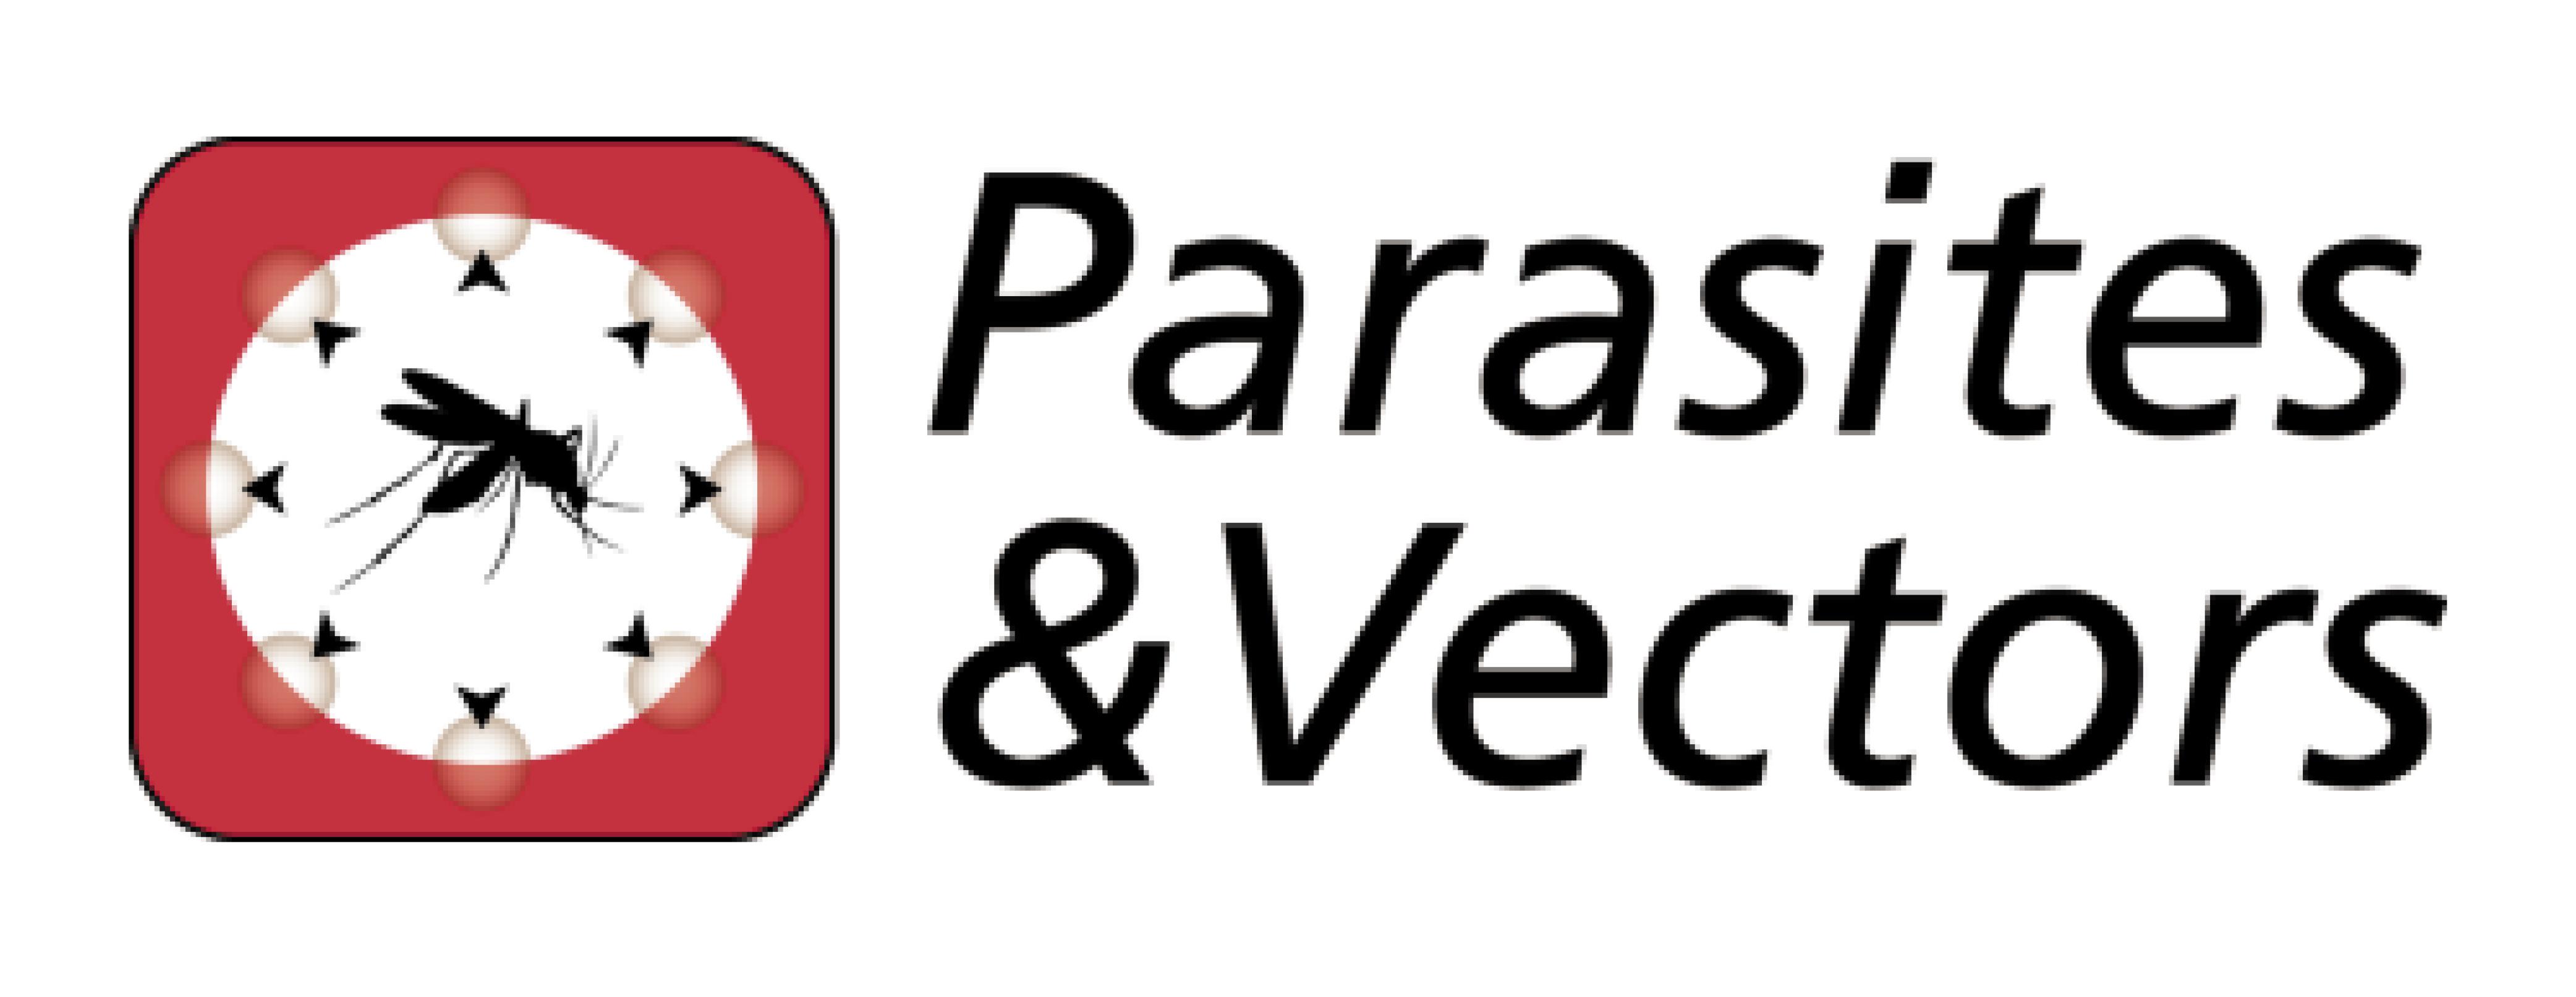 Parasites and Vectors